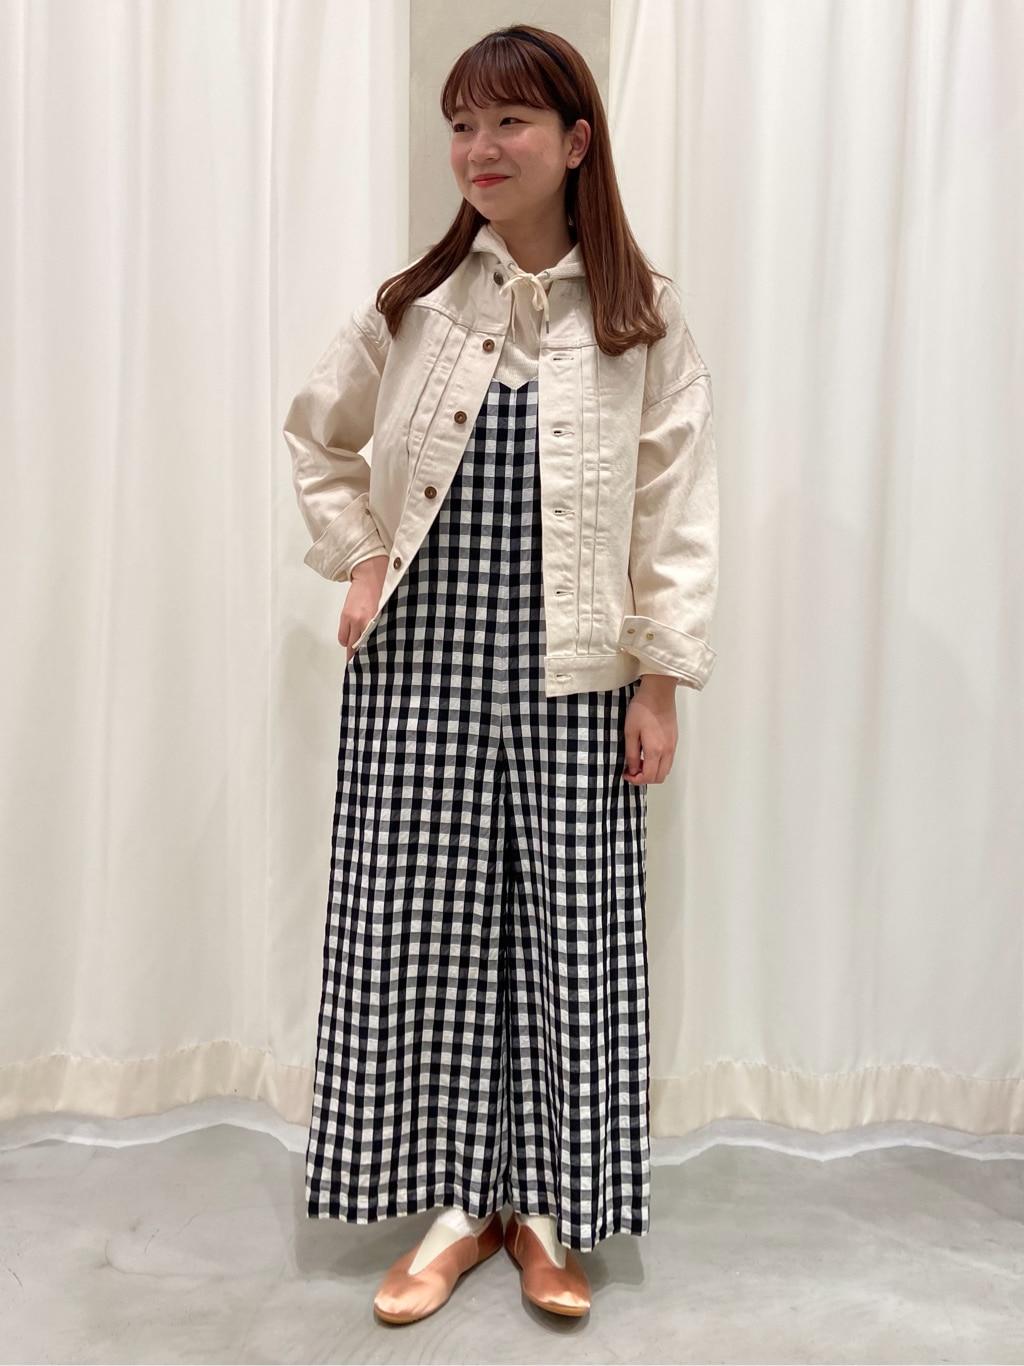 - CHILD WOMAN CHILD WOMAN , PAR ICI 東京スカイツリータウン・ソラマチ 身長:165cm 2021.02.09